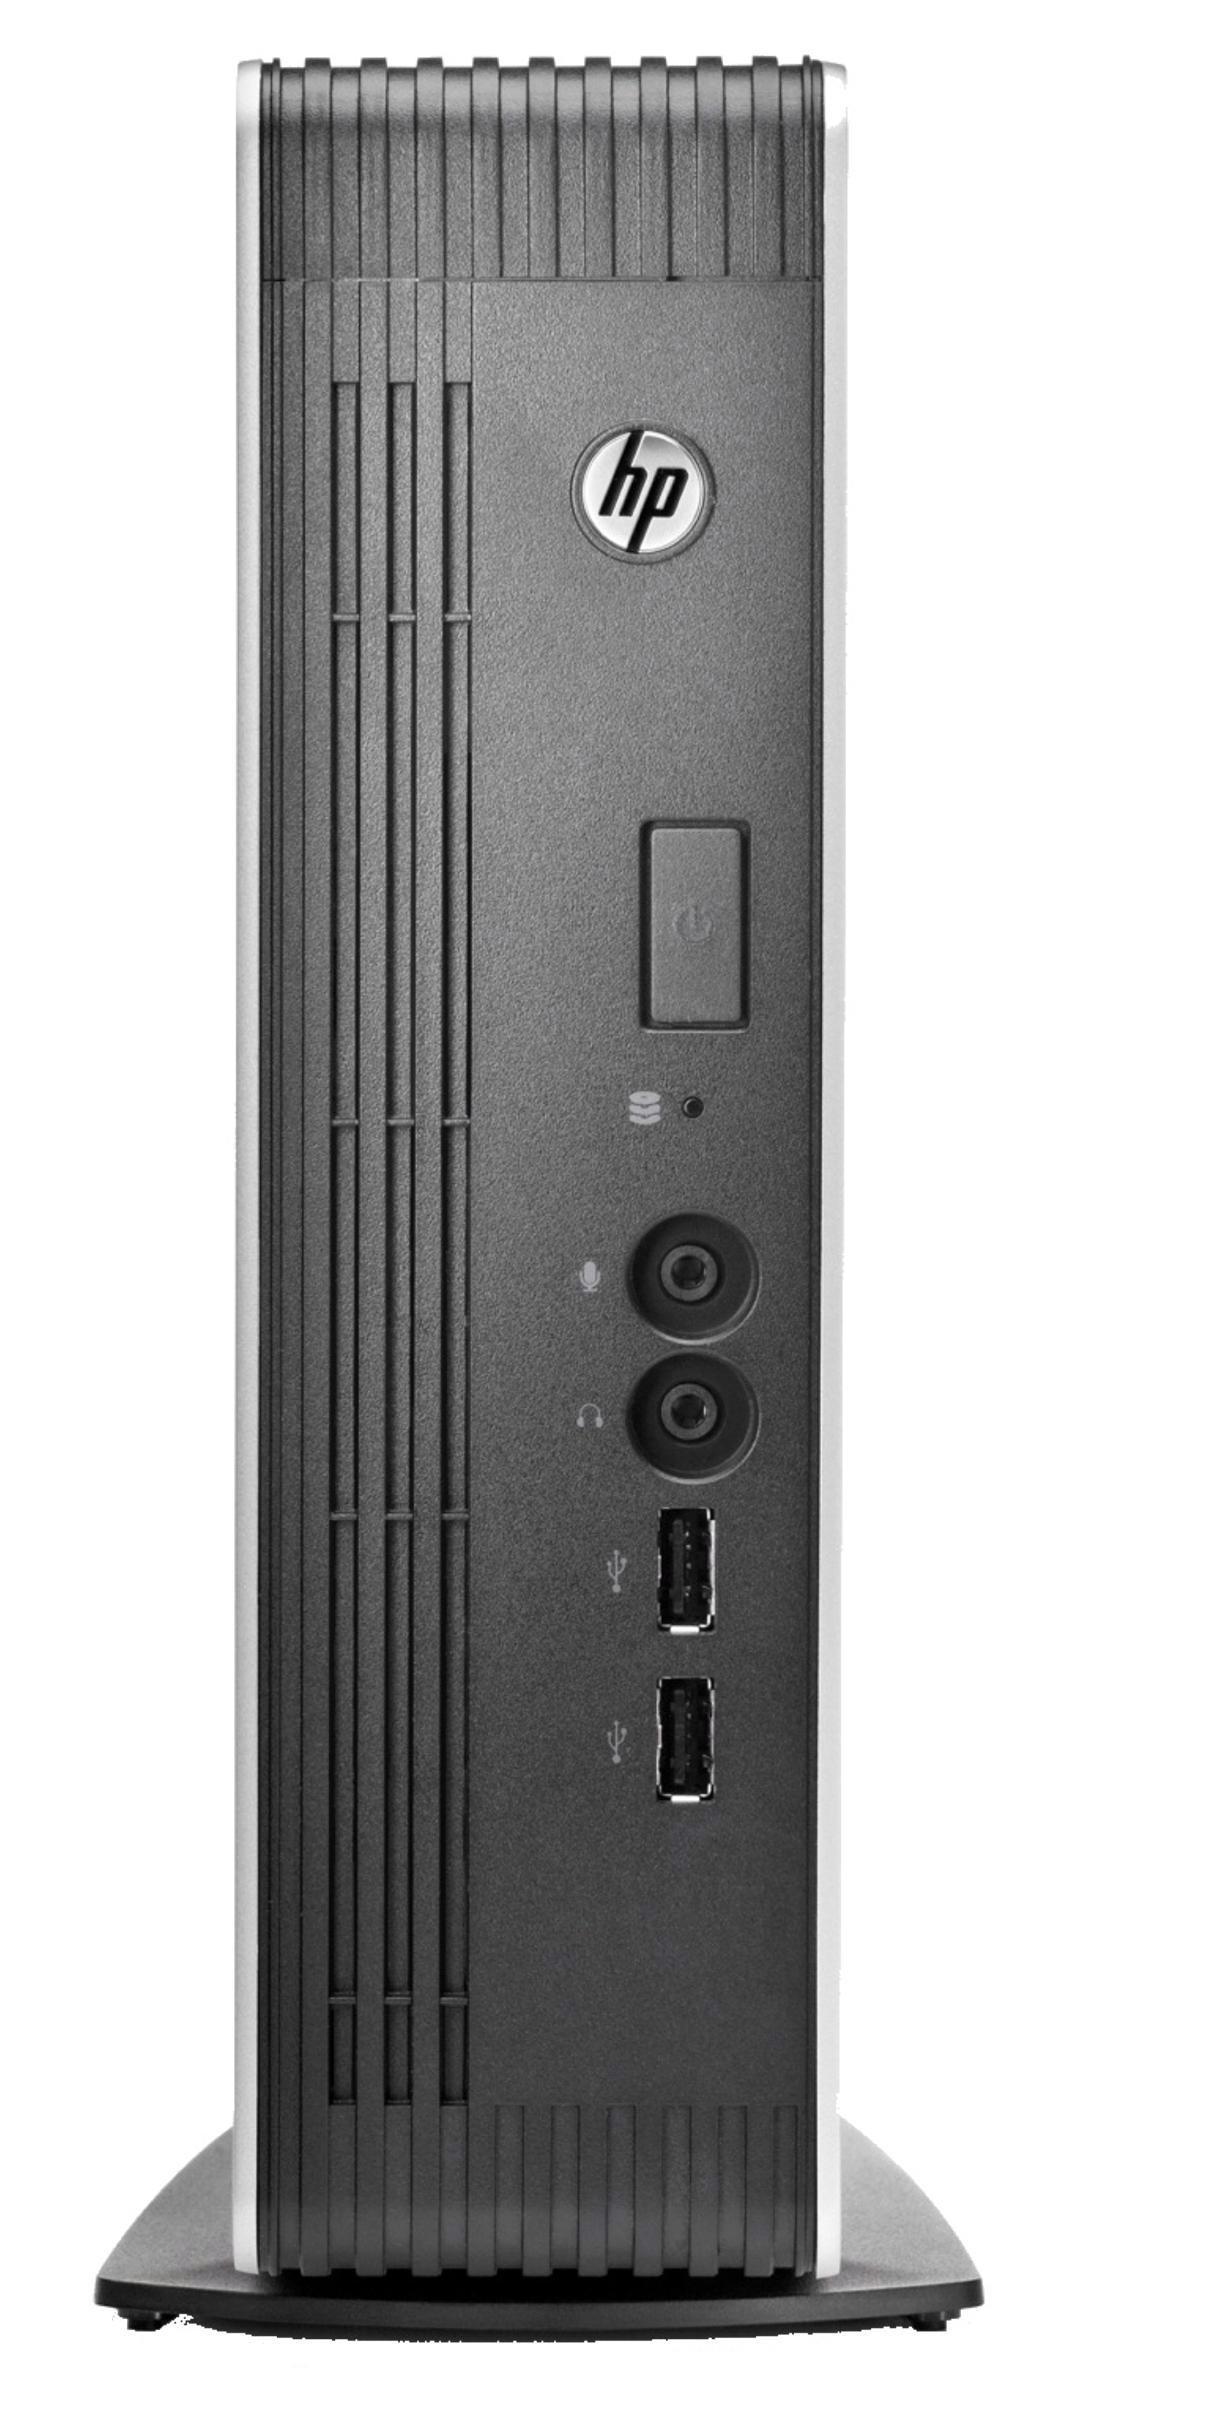 HP t610 PLUS Flexible Thin Client Dual Core (T56N) 1.65GHz 4GB LAN Windows 7 Standard Embedded